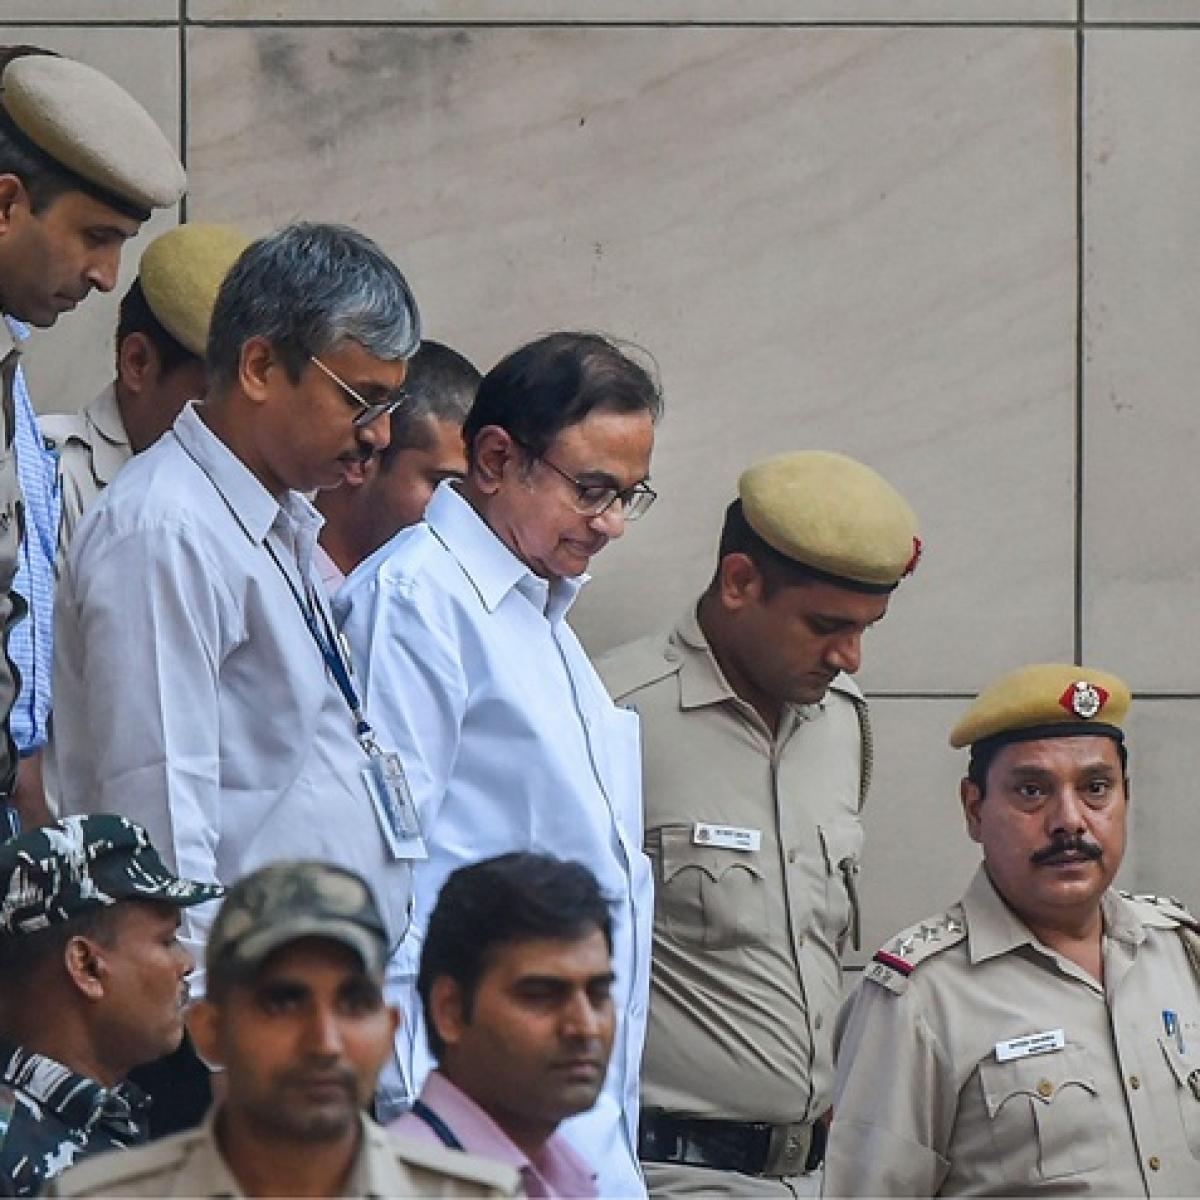 P Chidambaram is a victim of persecution: Congress